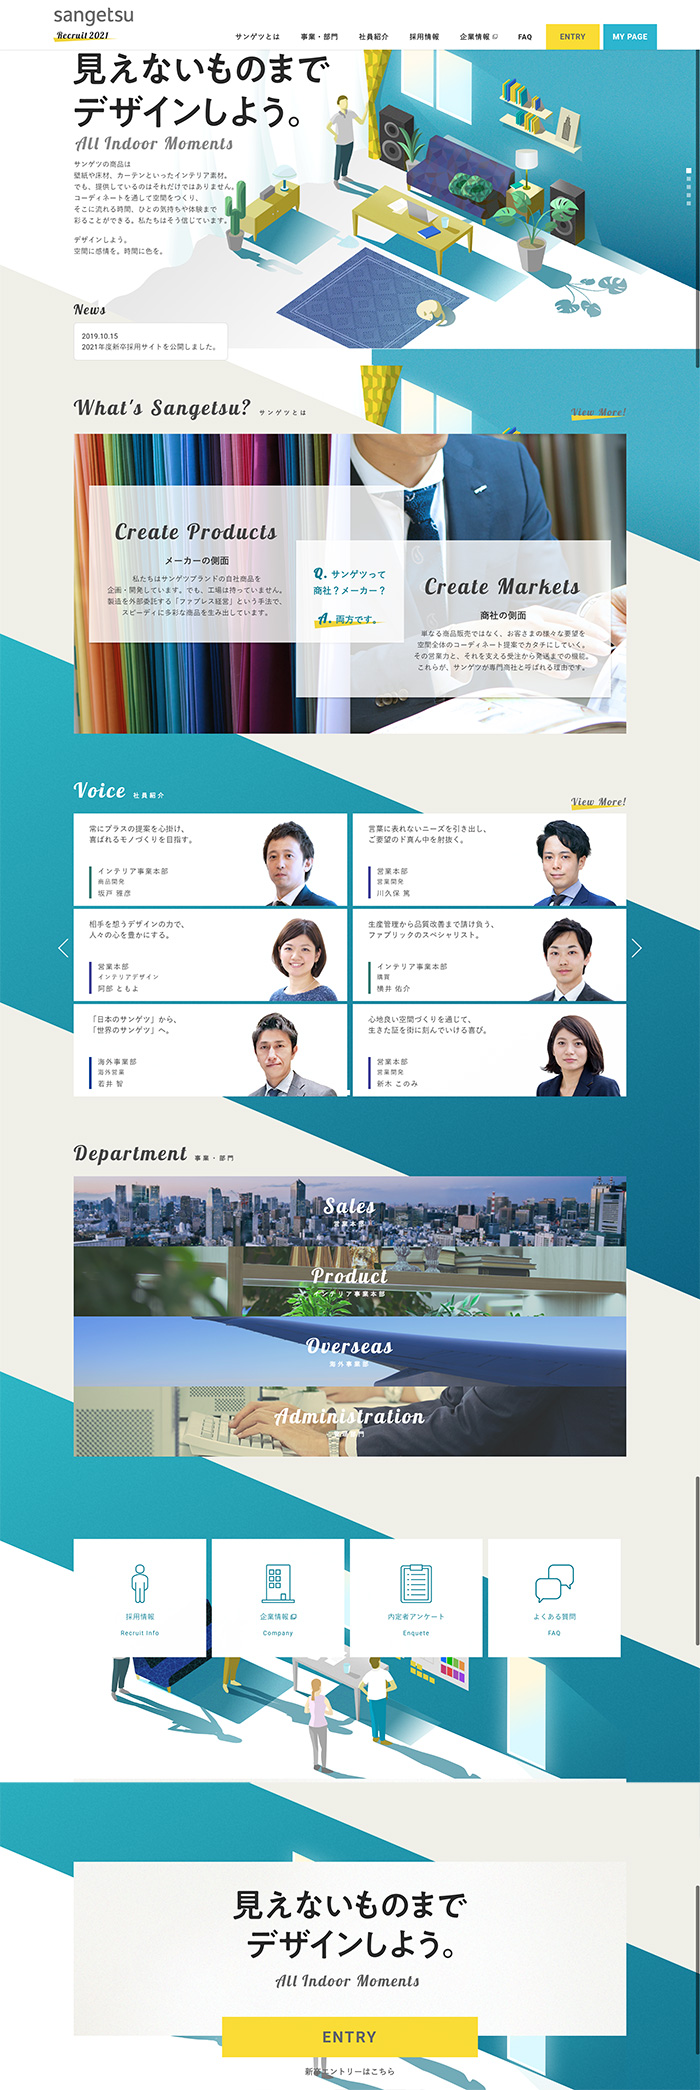 SANGETSU Recruit 2021 | 株式会社サンゲツ新卒採用情報